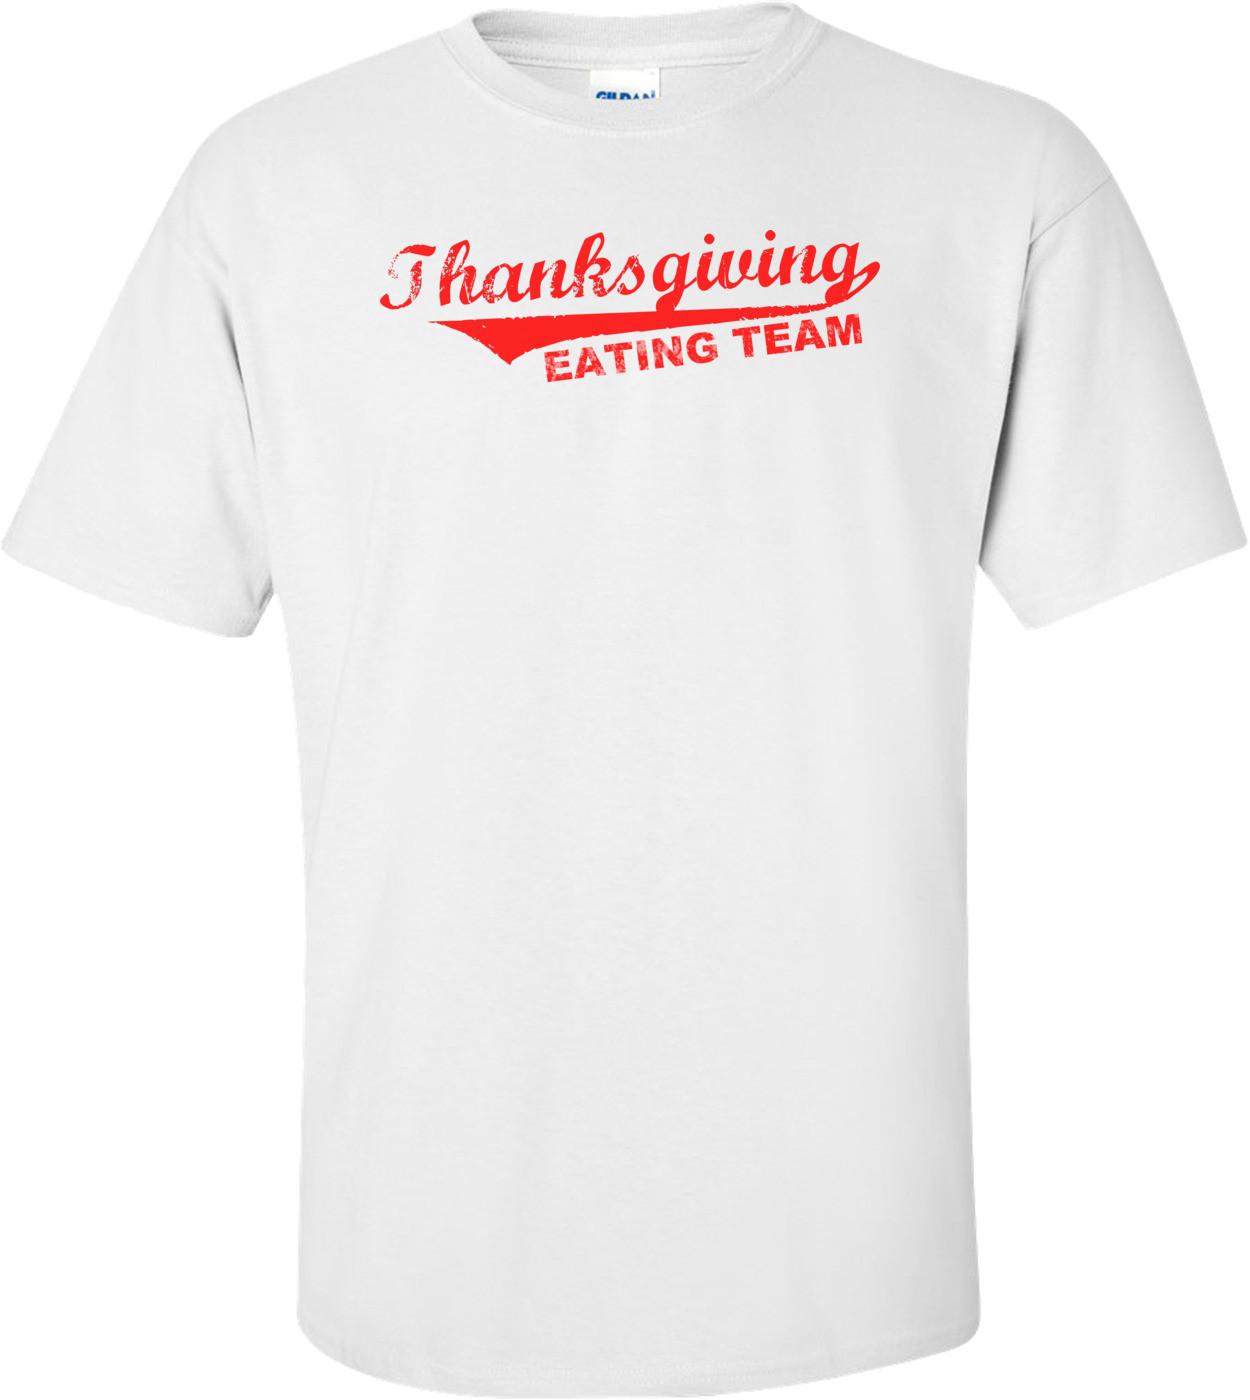 Thanksgiving Eating Team Shirt